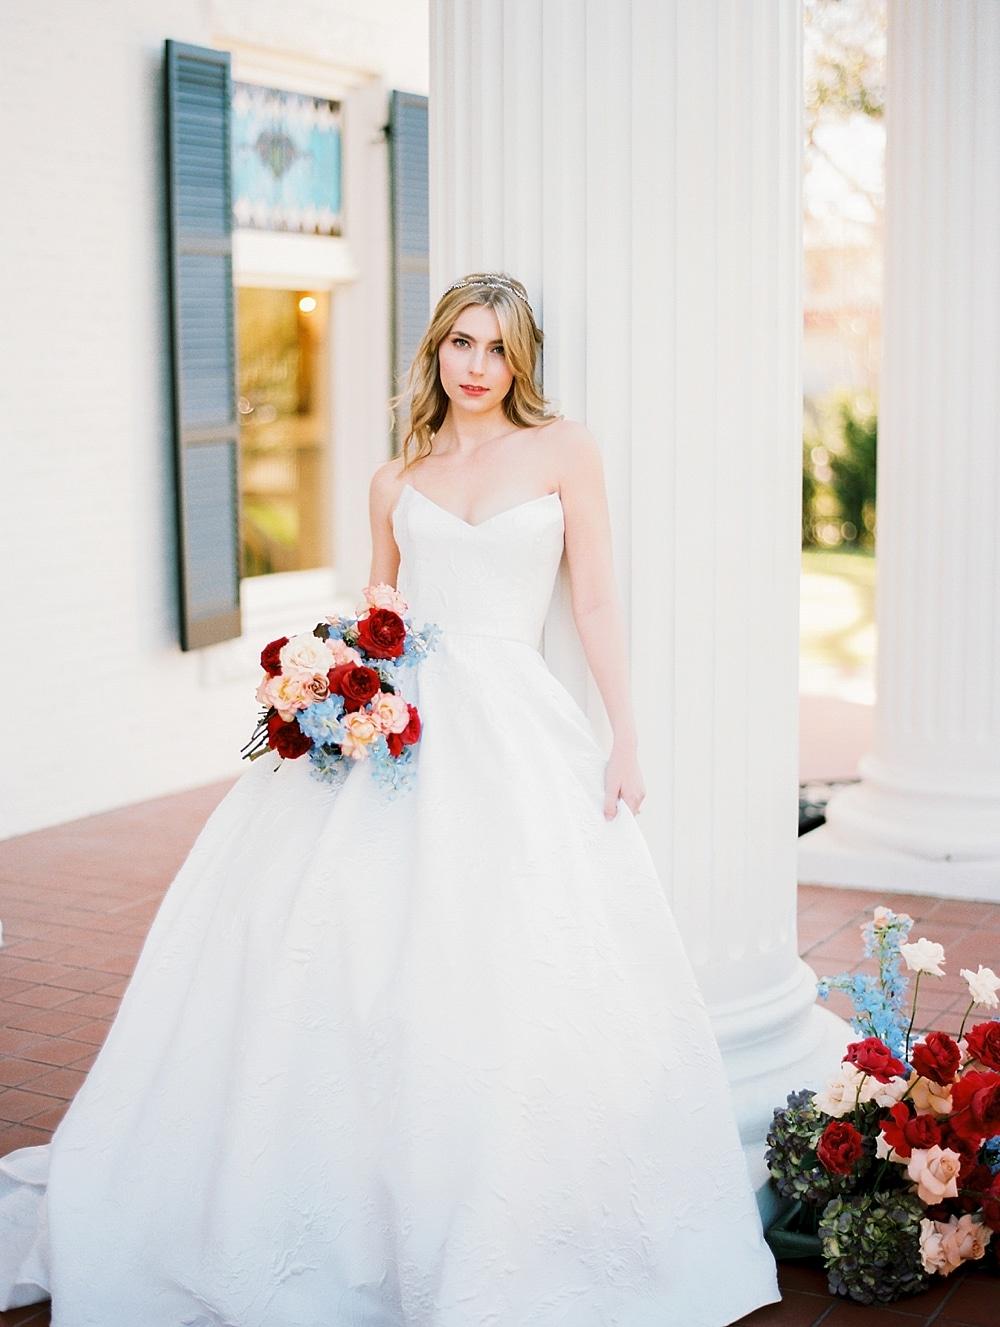 kristin-la-voie-photography-austin-wedding-photographer-woodbine-mansion-146